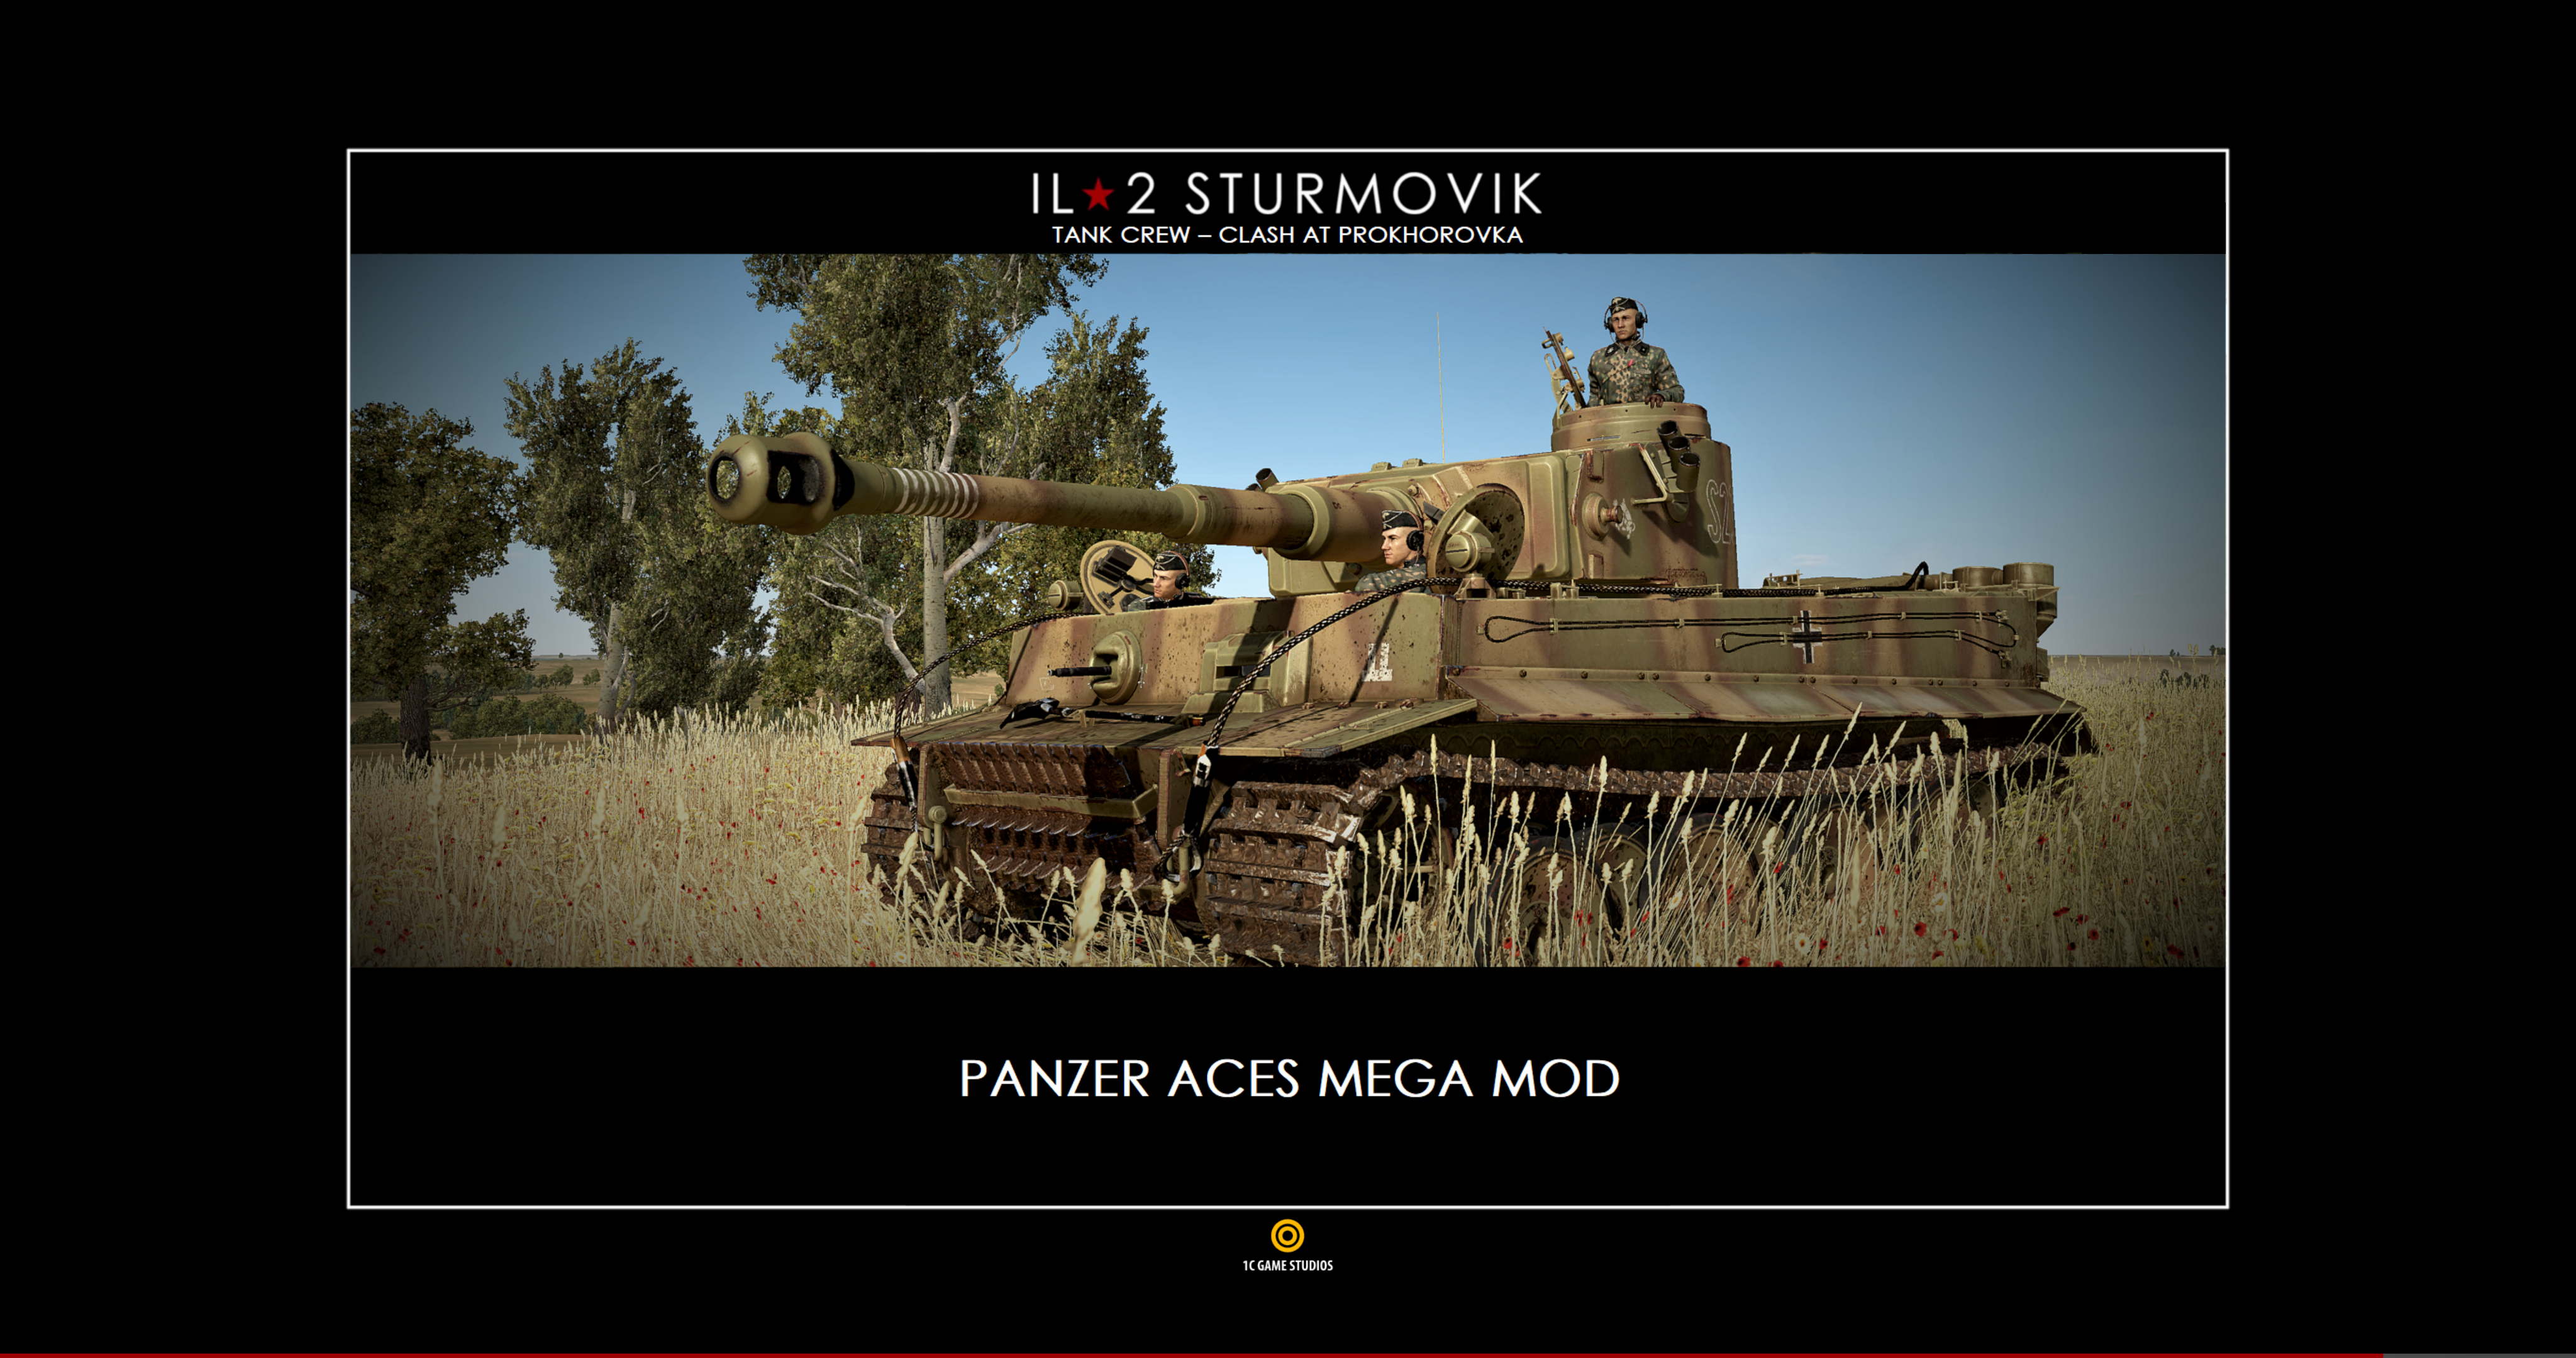 Achtung-Panzer-Mega-Mod-Promotional-Bann